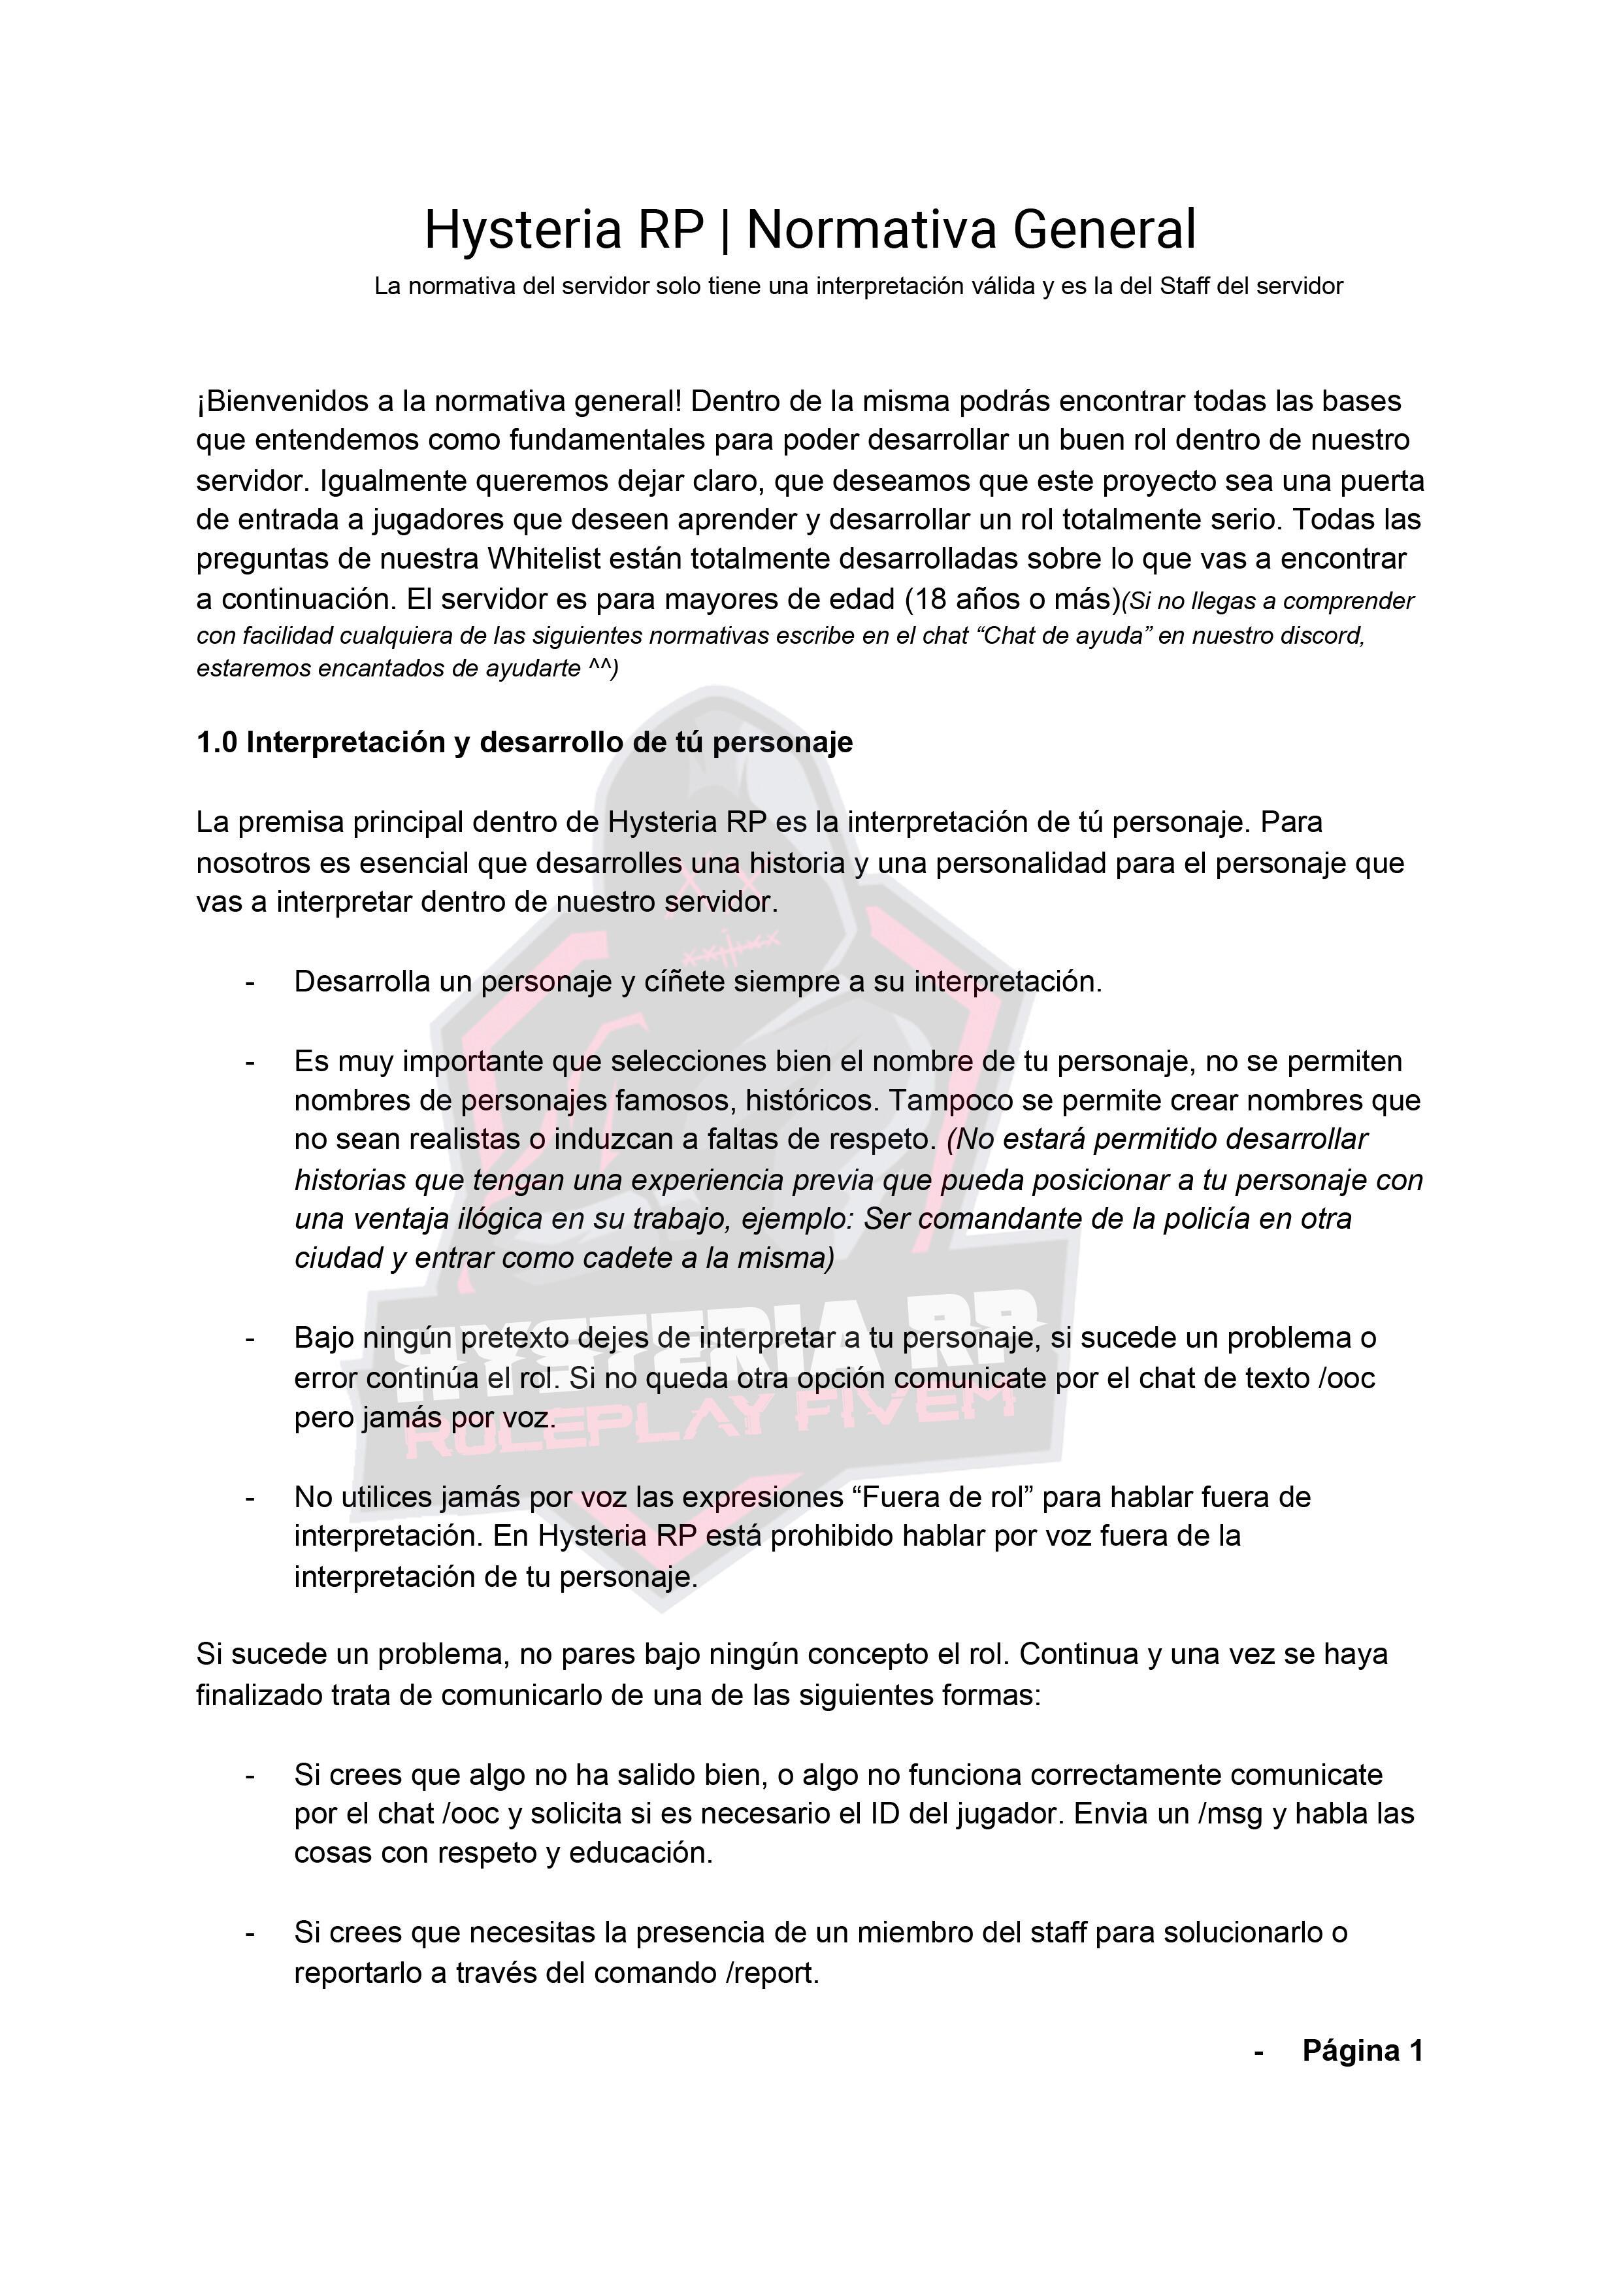 Normativa General | Hysteria RP Normat12